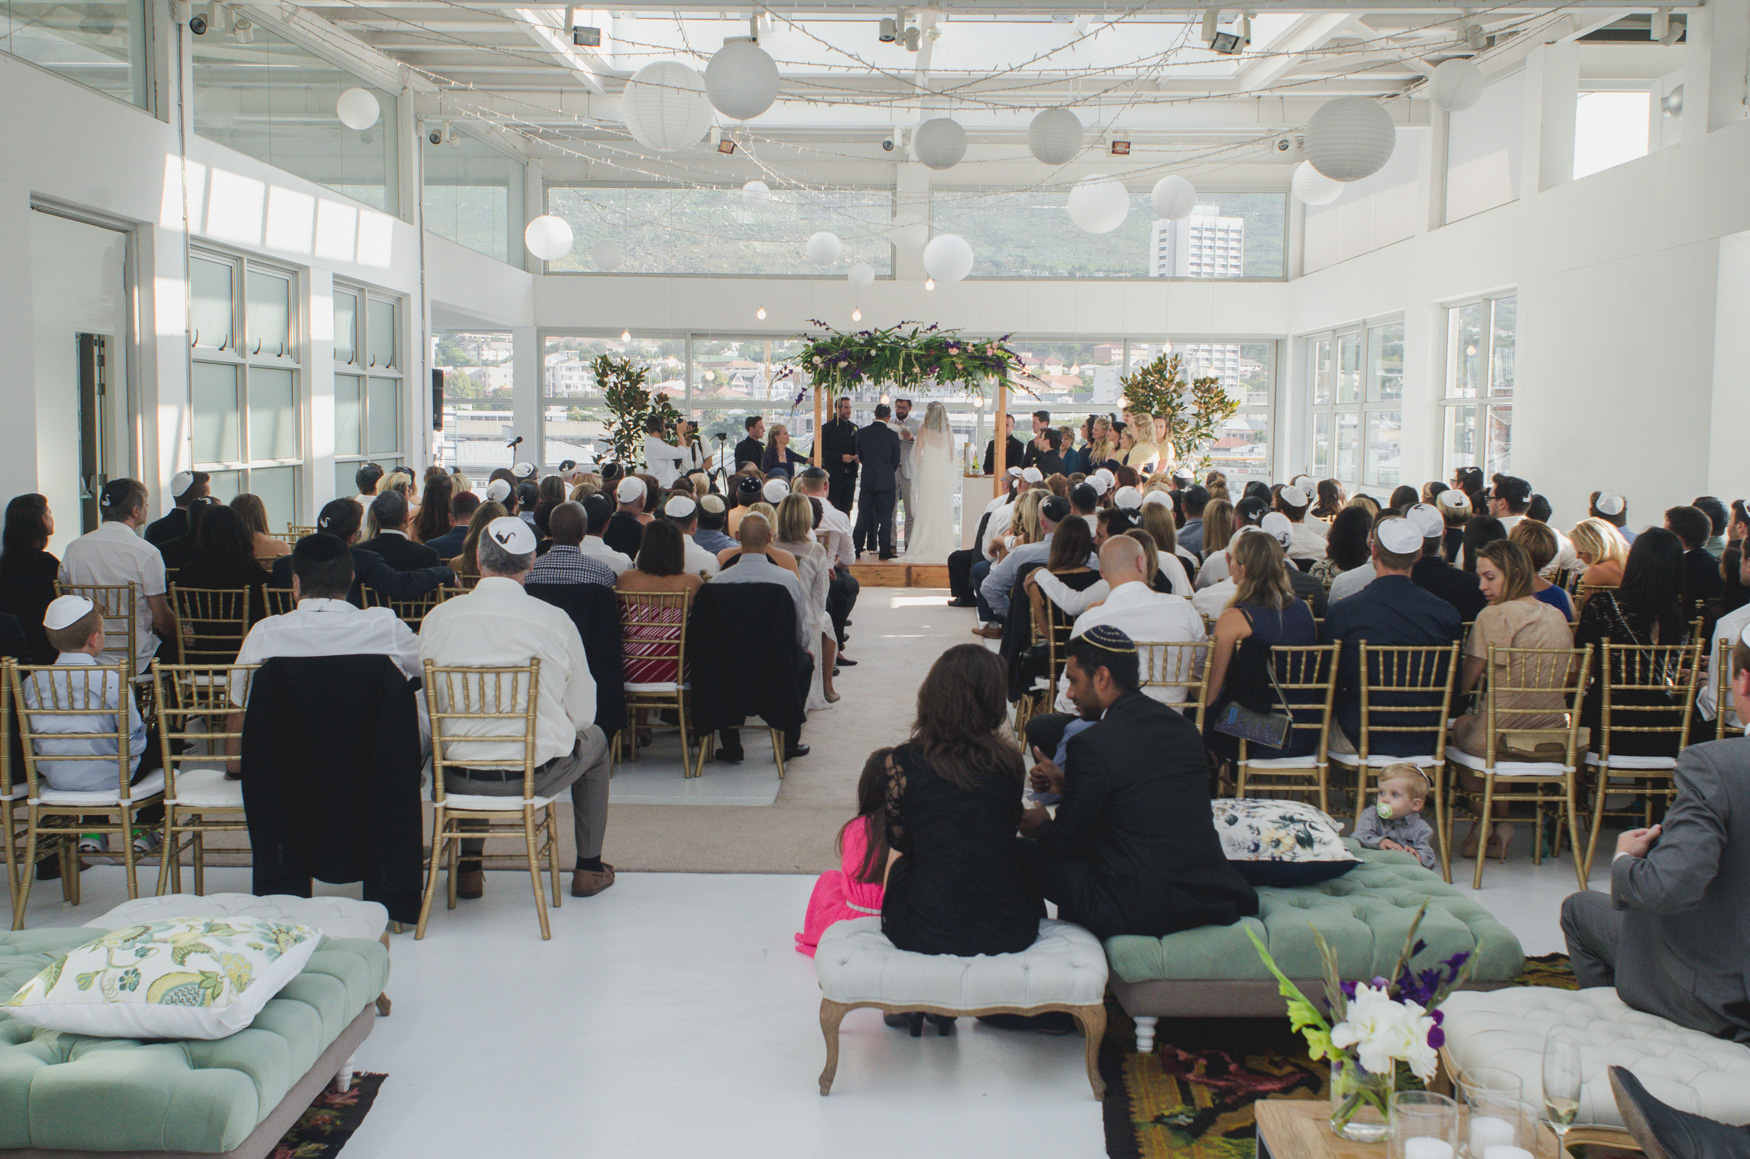 john-henry-wedding-photographer-mike-louise-001-11.jpg